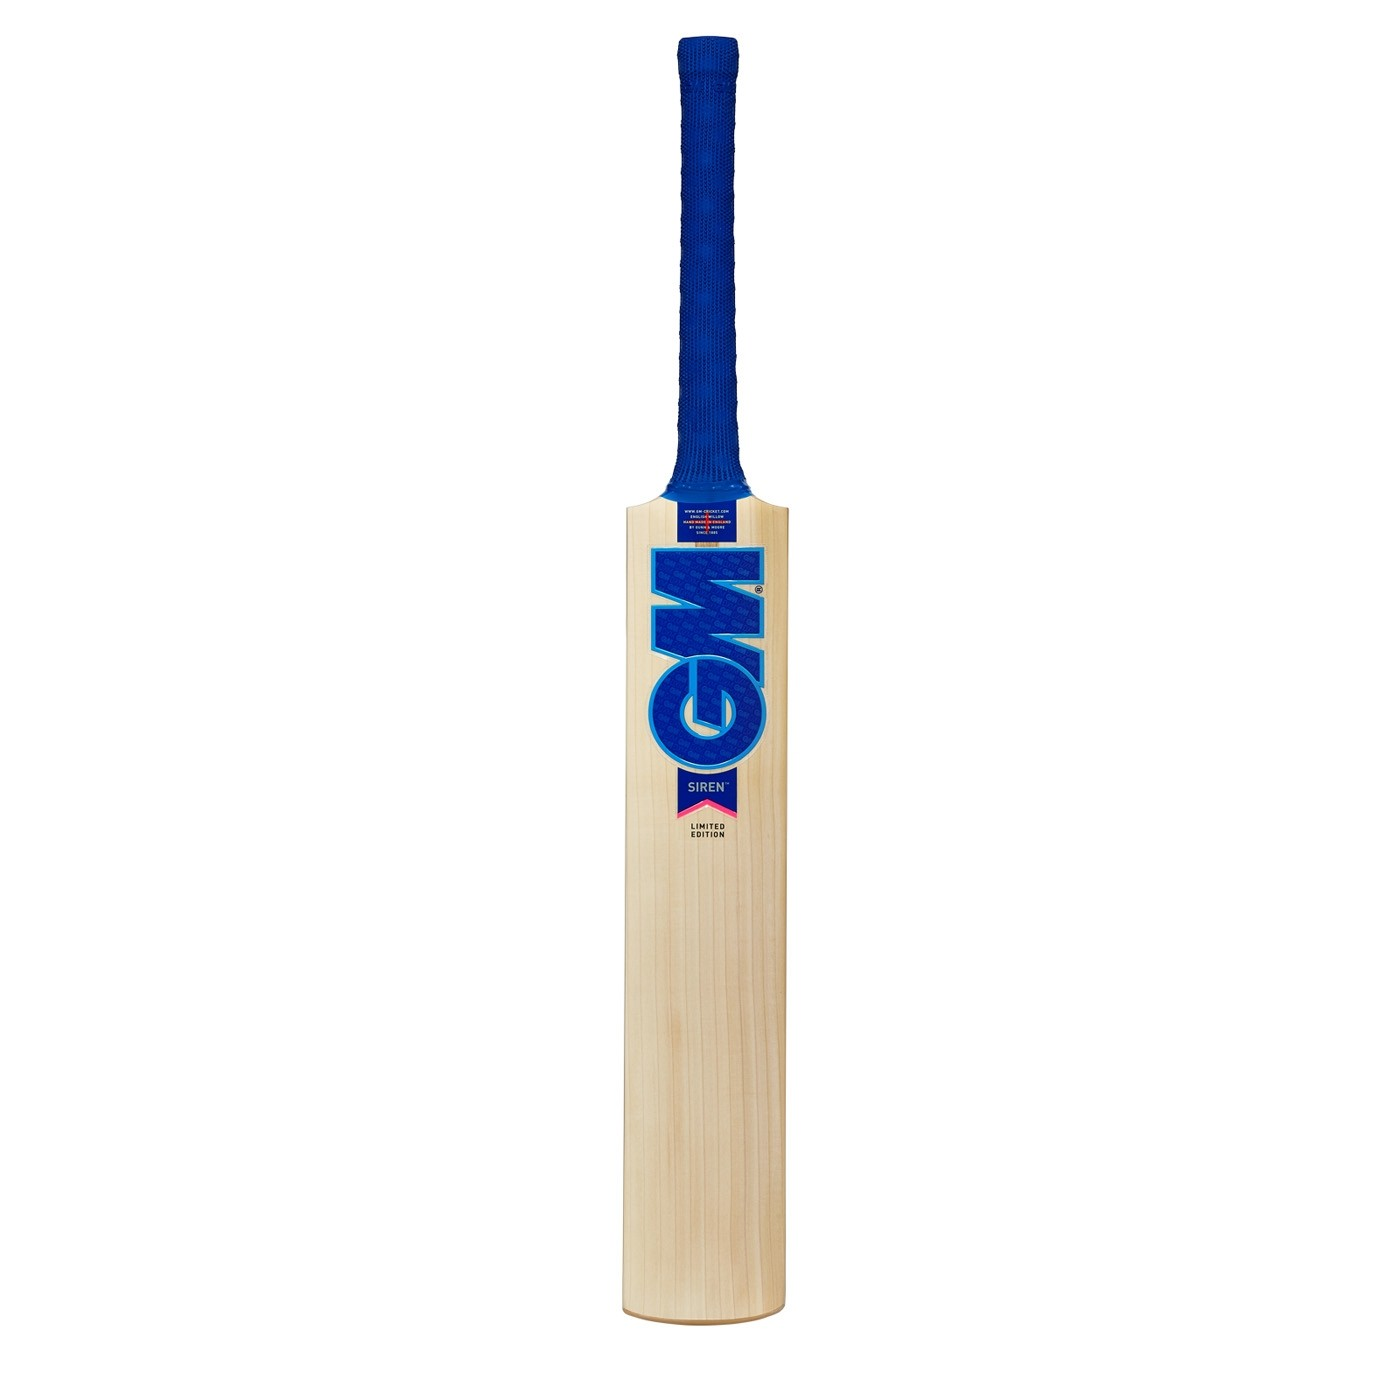 2021 Gunn and Moore Siren DXM 808 Cricket Bat